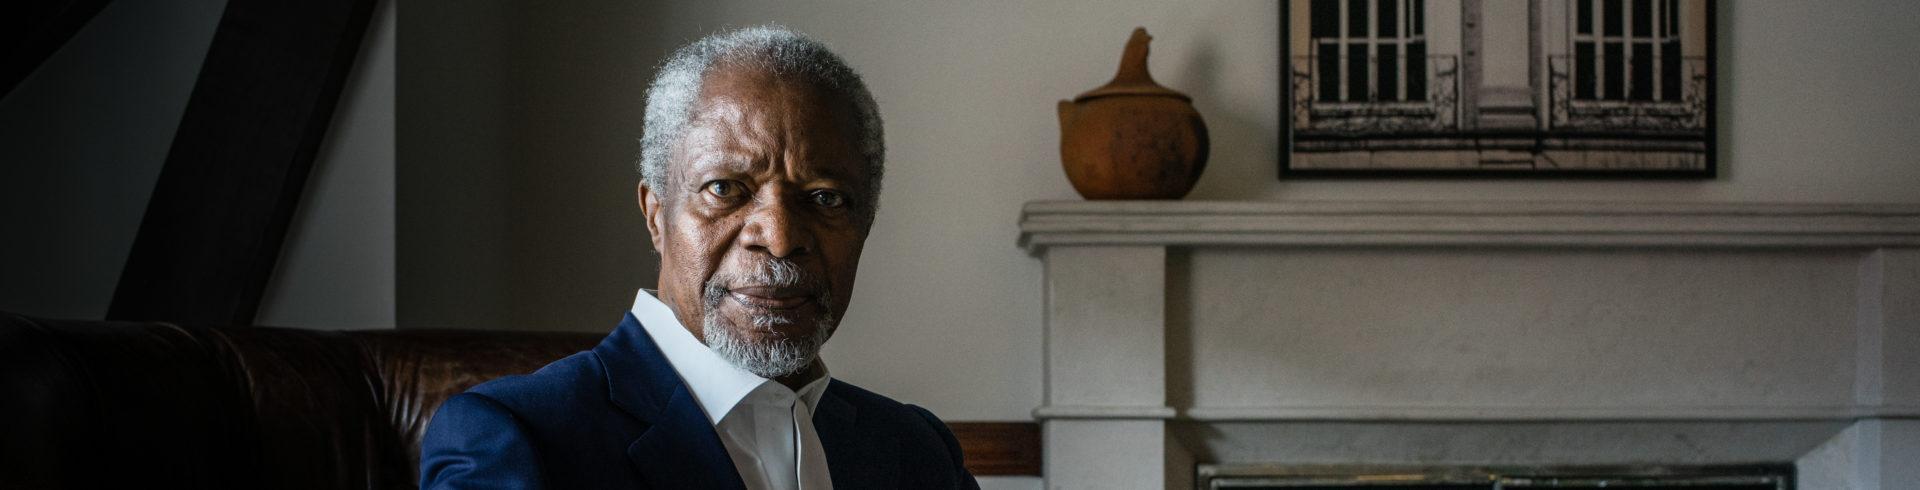 Kofi Annan - Can Post-Violence Reconciliation Succeed?